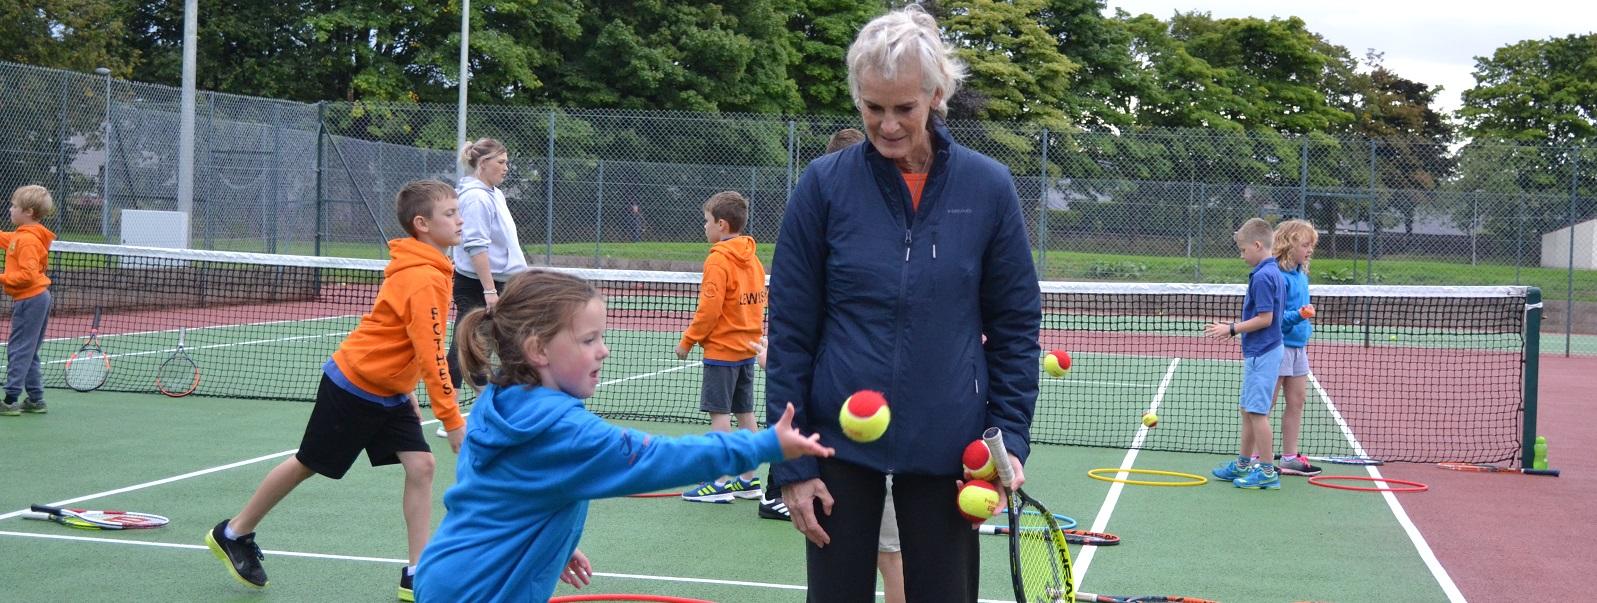 Marine Park Tennis Club Lossiemouth